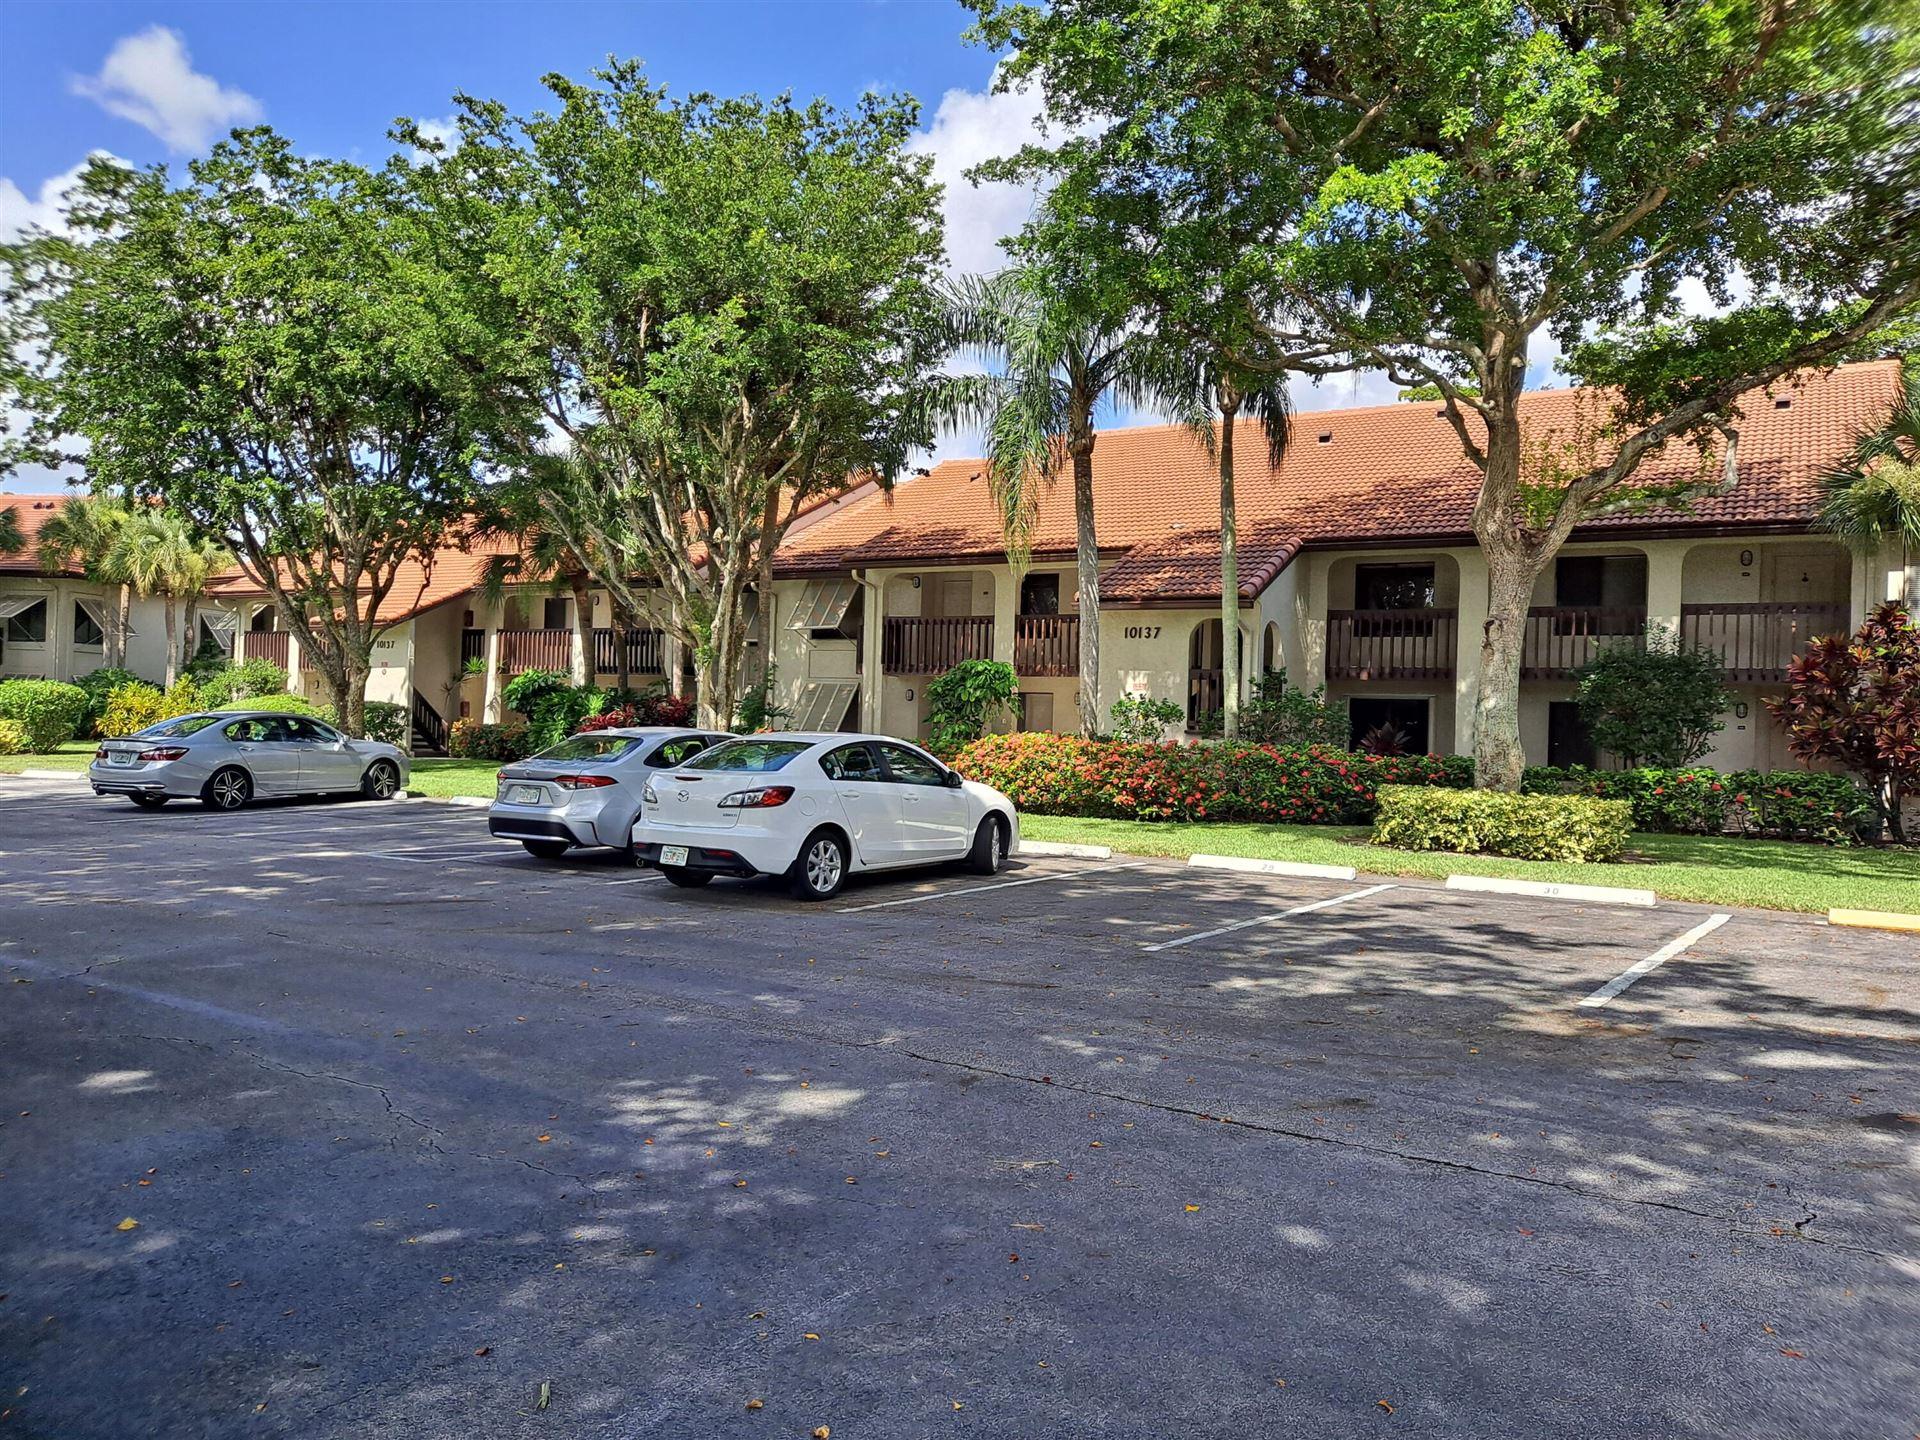 10137 Mangrove Drive #202, Boynton Beach, FL 33437 - MLS#: RX-10734906